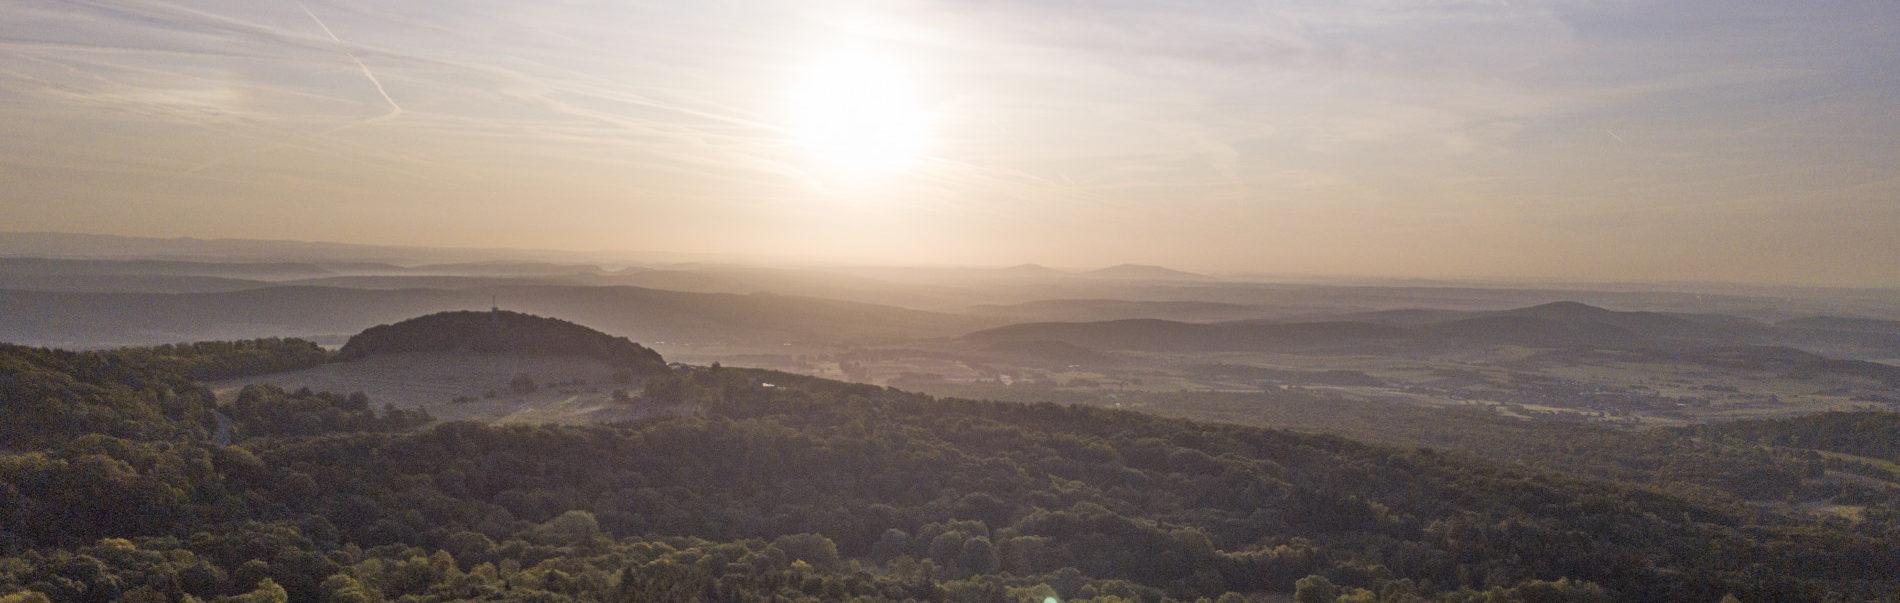 Sonnenaufgang über der Streutalallianz (Foto: Leska Hörner - Leskas Wunderwelt)